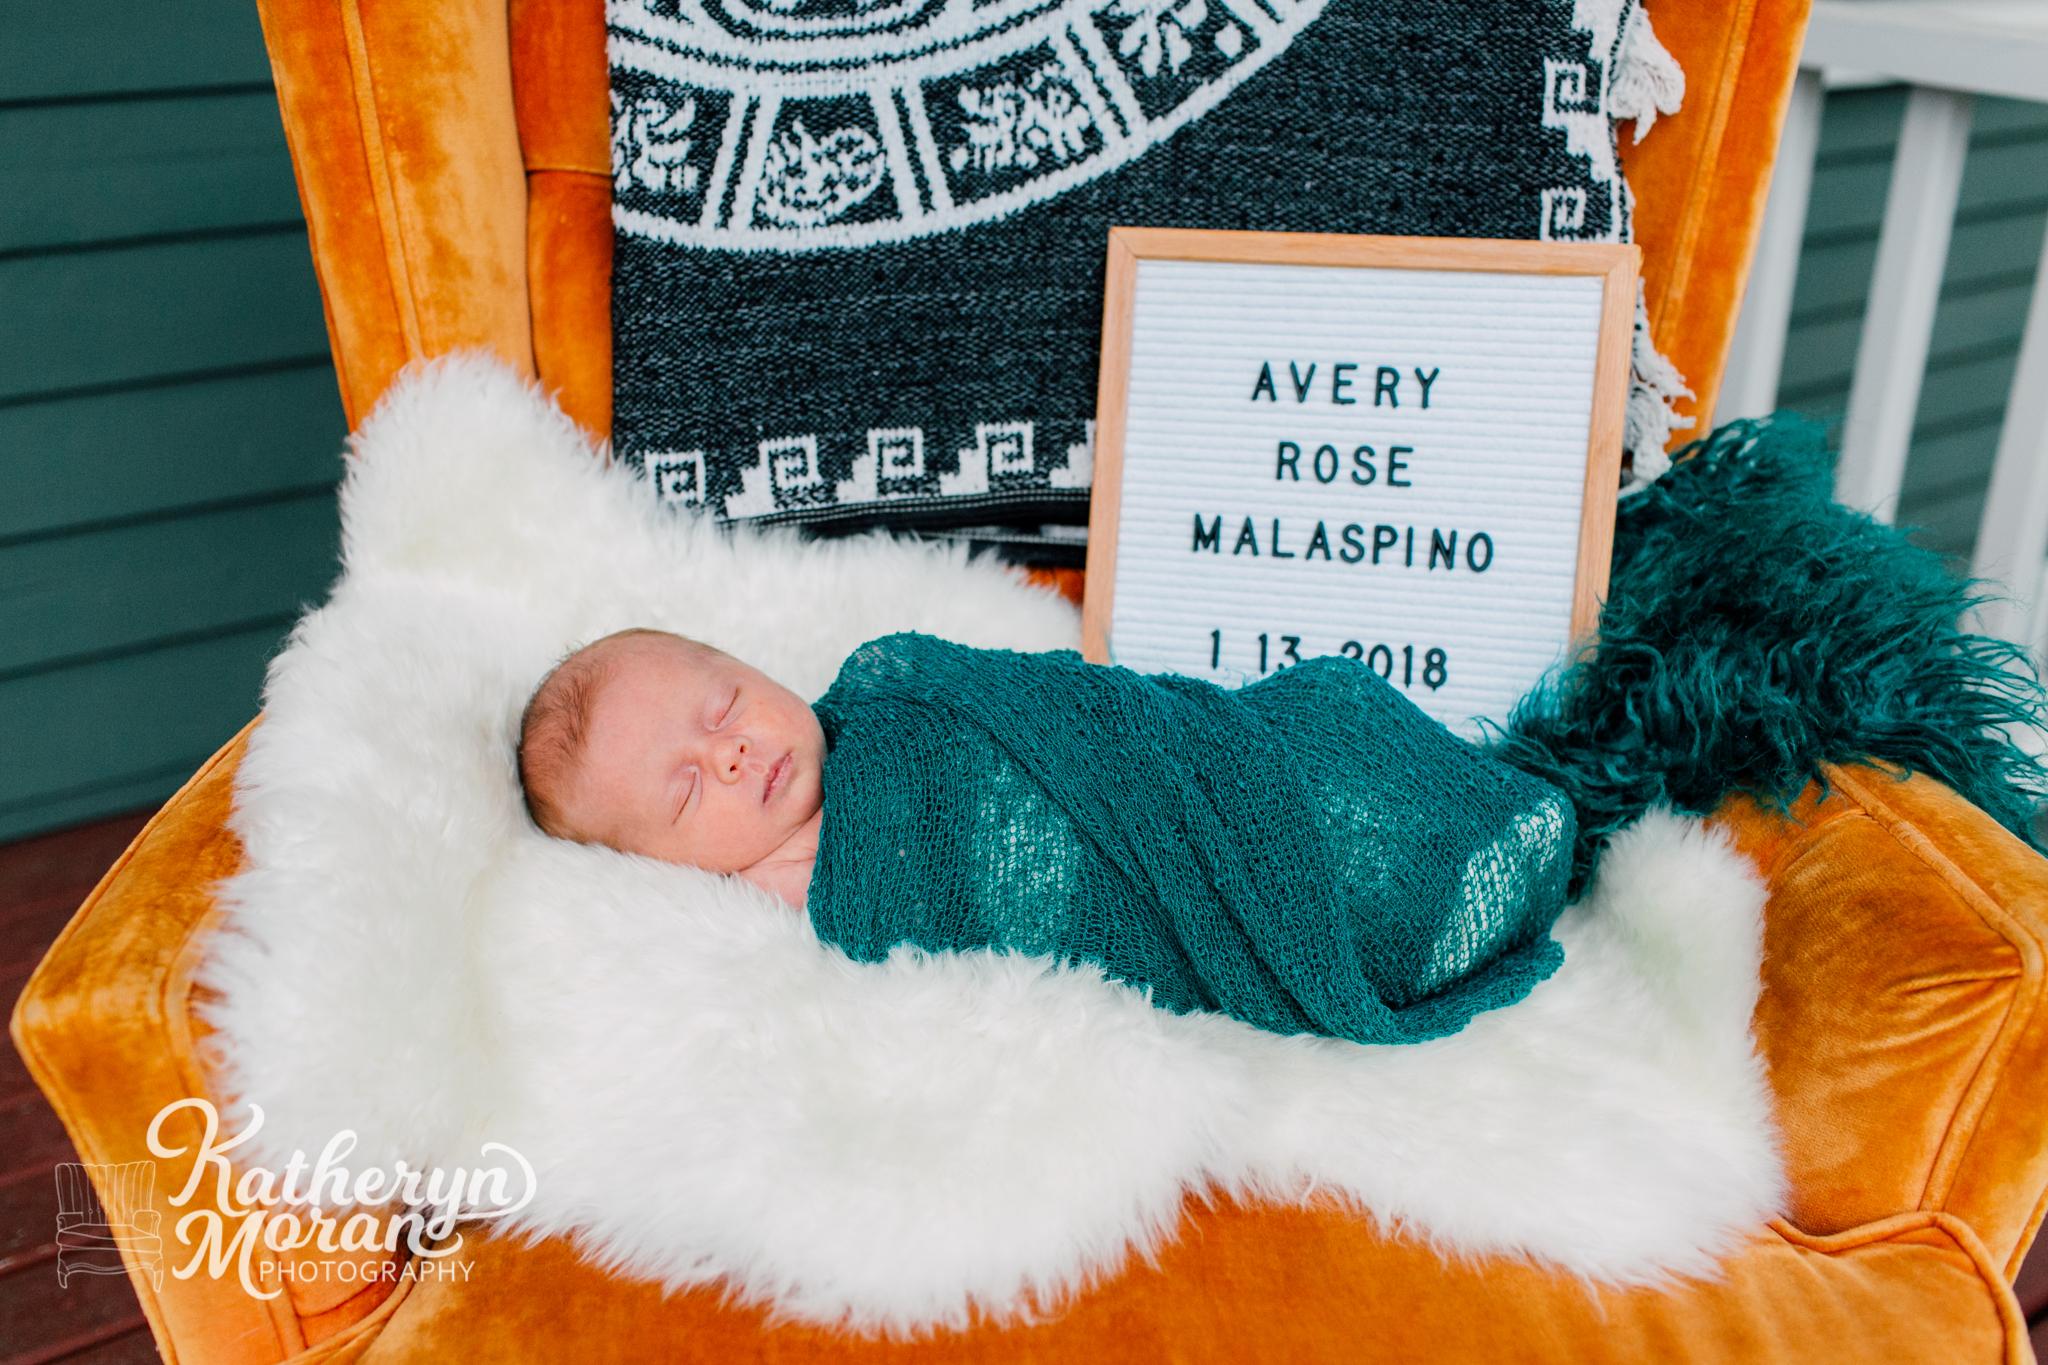 seattle-newborn-photographer-katheryn-moran-avery-malaspino-6.jpg